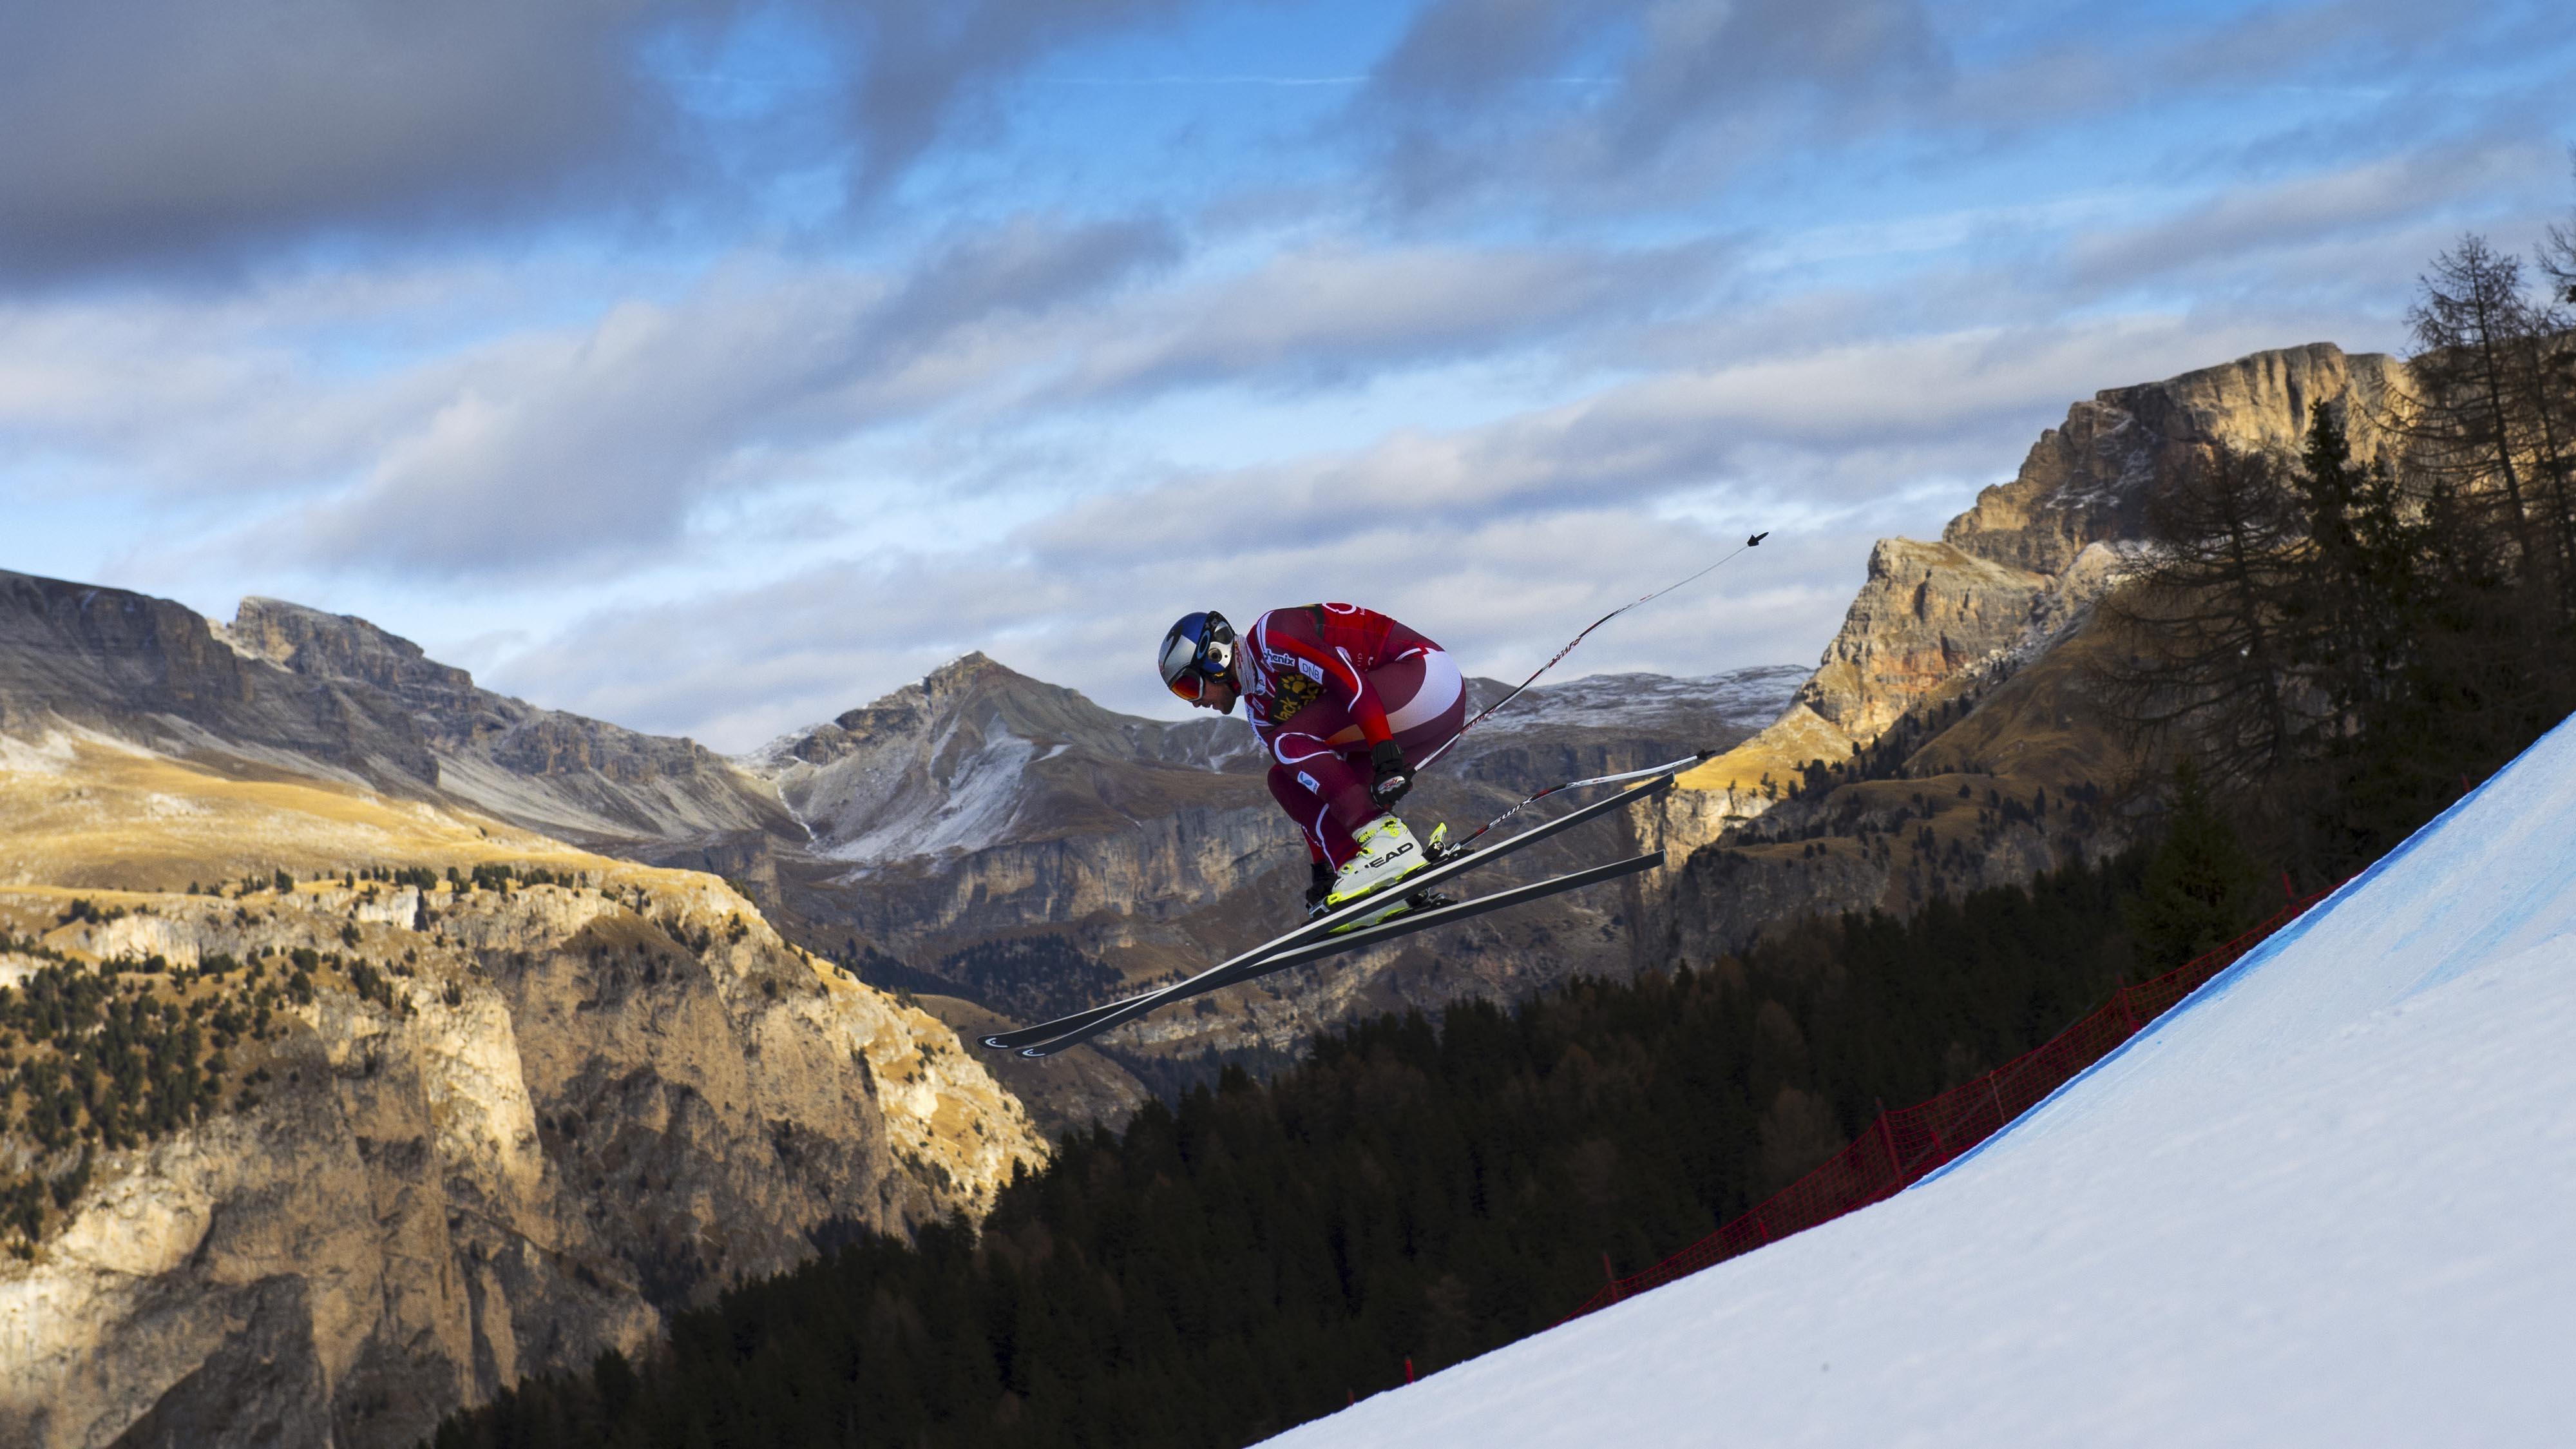 Aksel Svindal, Ski WC, Italy 2015